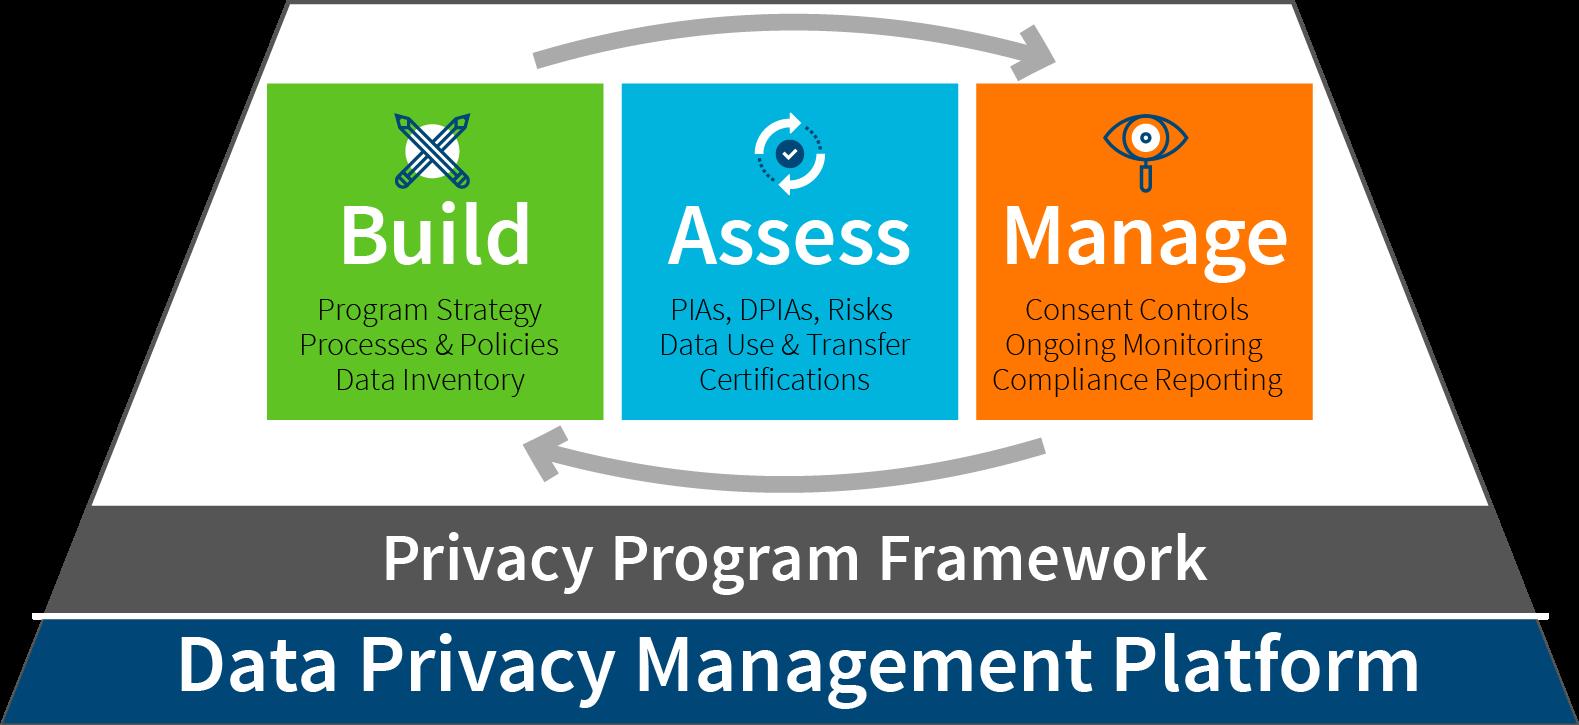 Data Privacy Management Platform